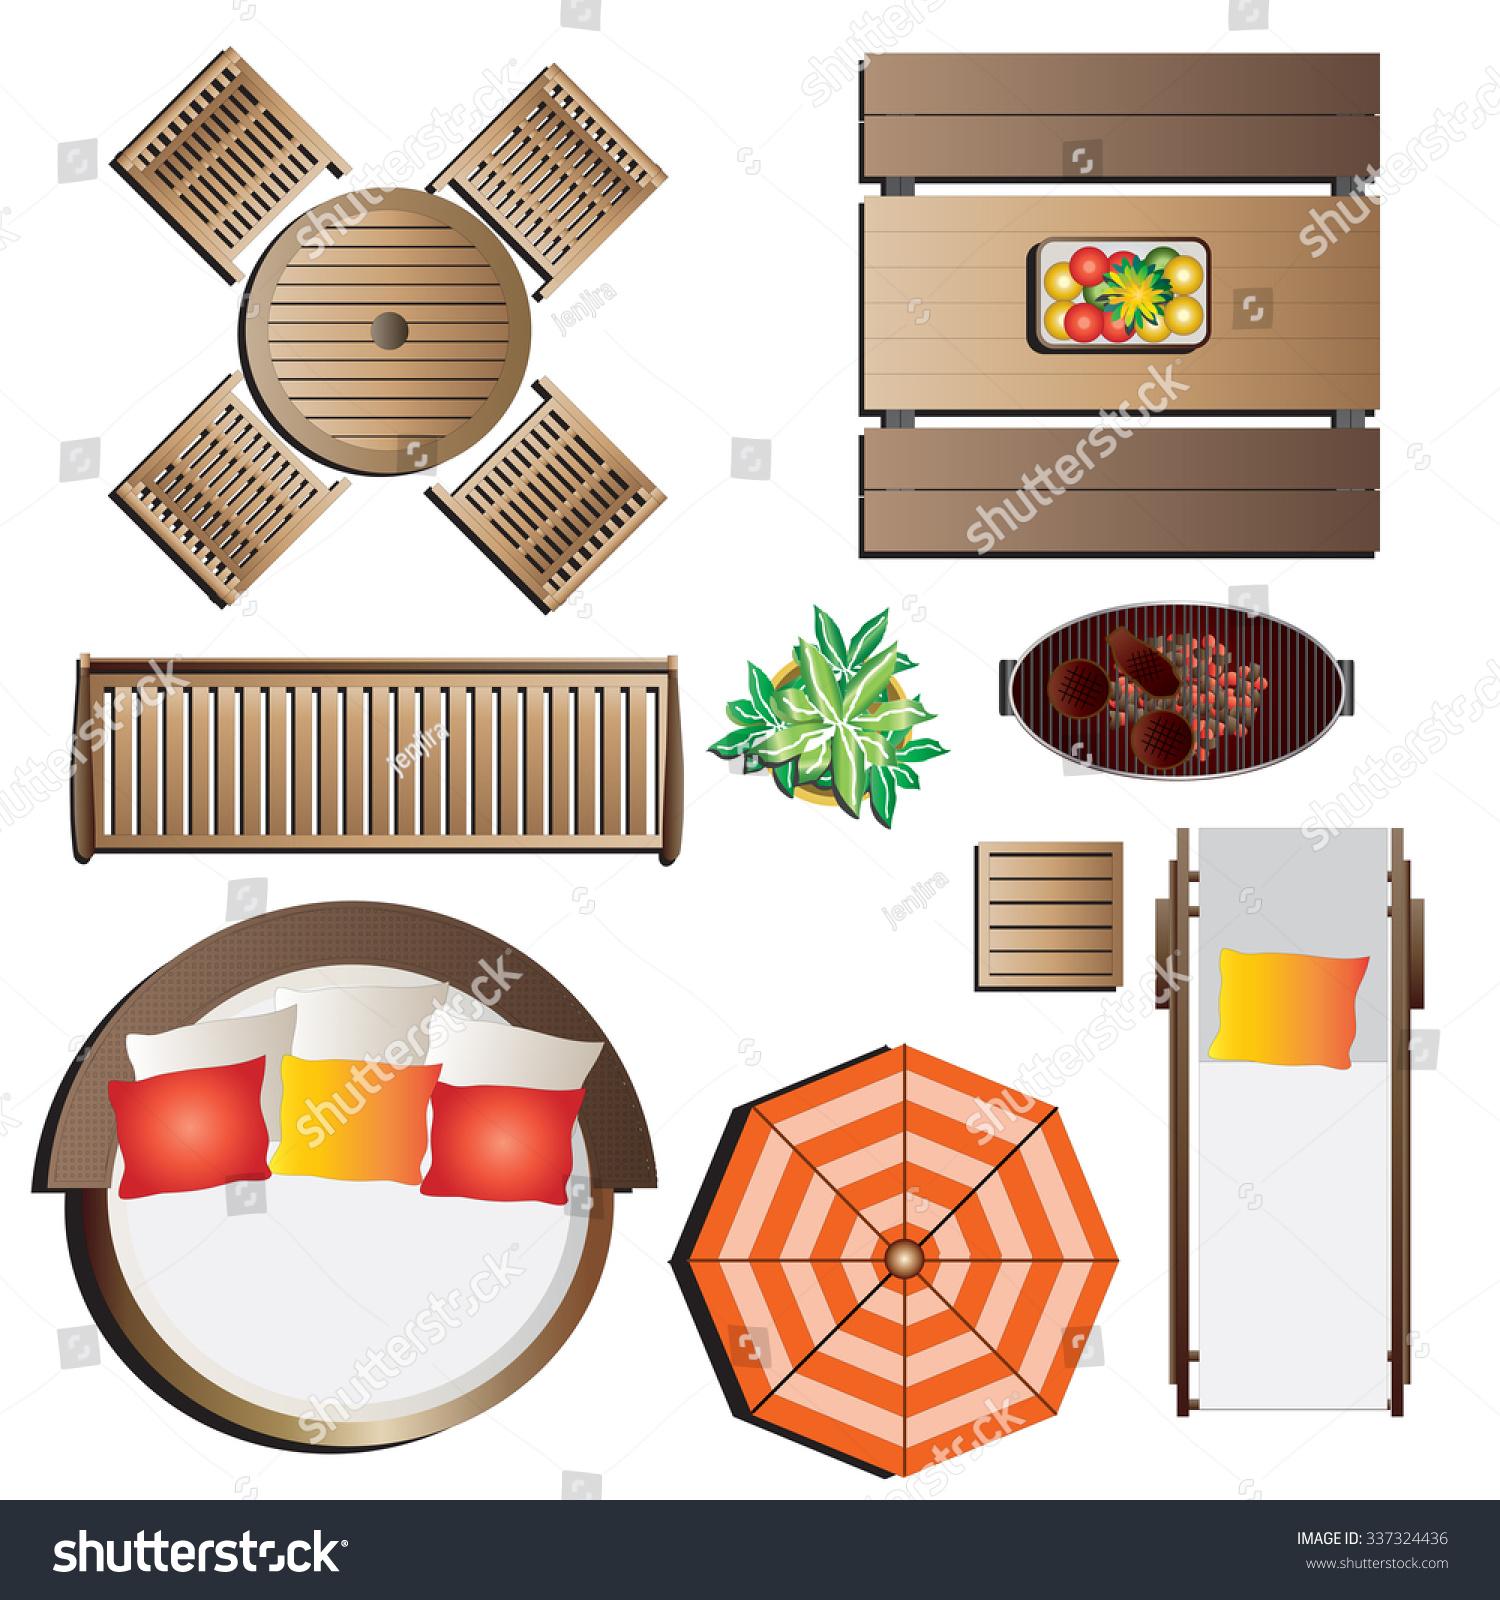 outdoor furniture top view set 13 for landscape design - Garden Furniture Top View